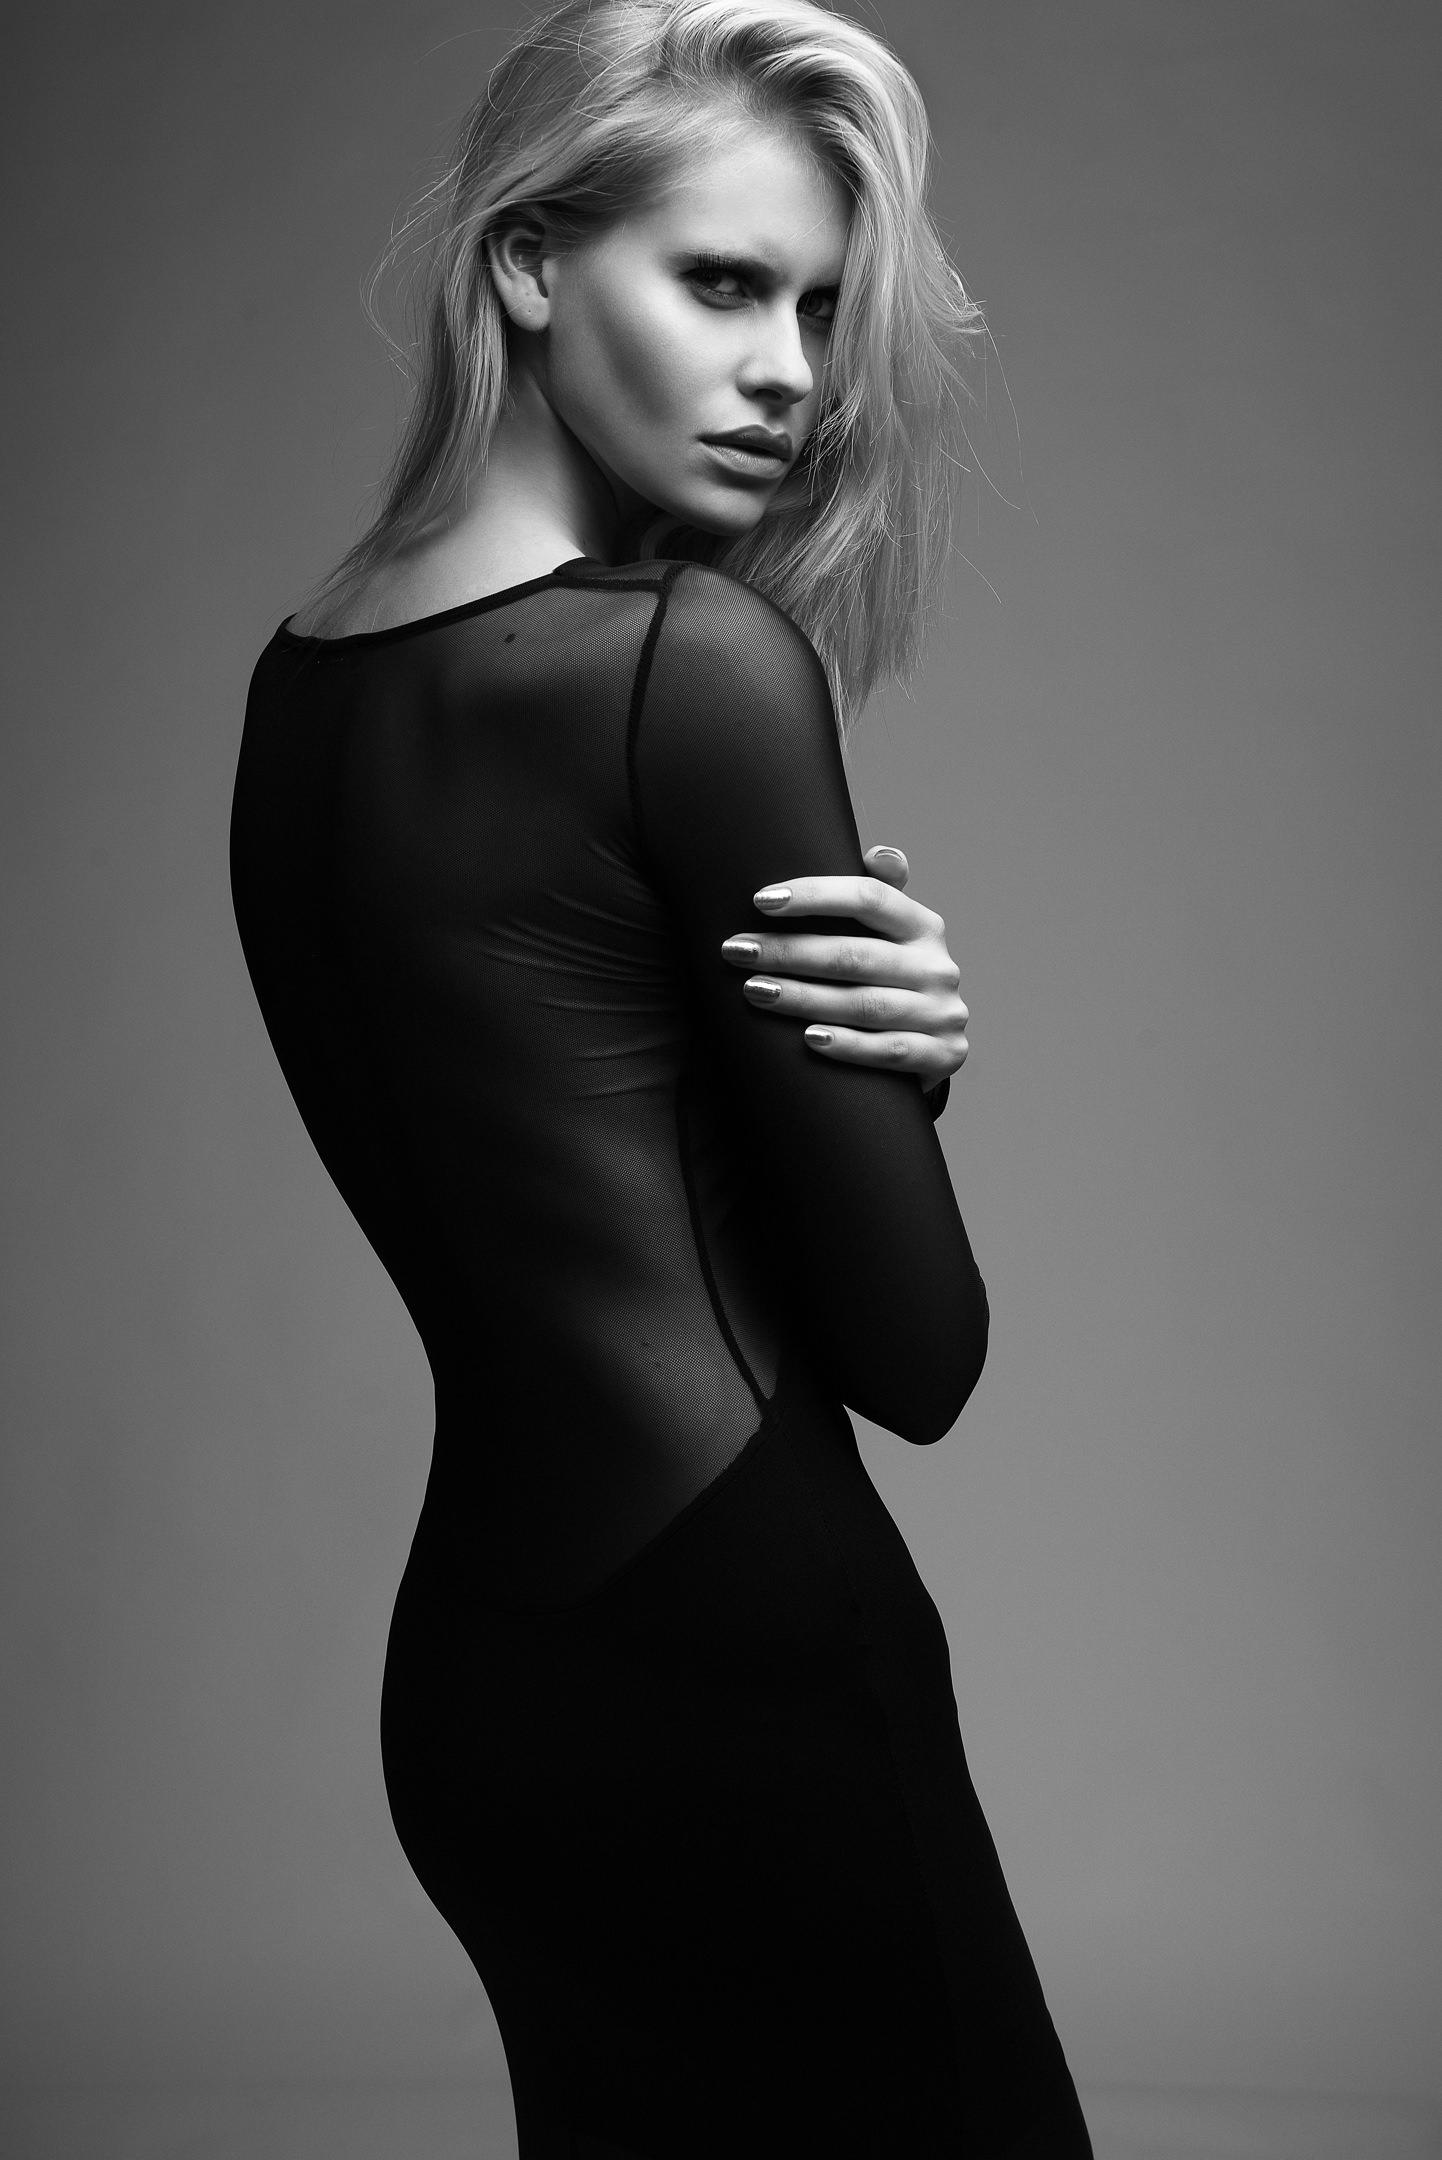 Maleficent-by-ANNA-BAZHANOVA-dh-8